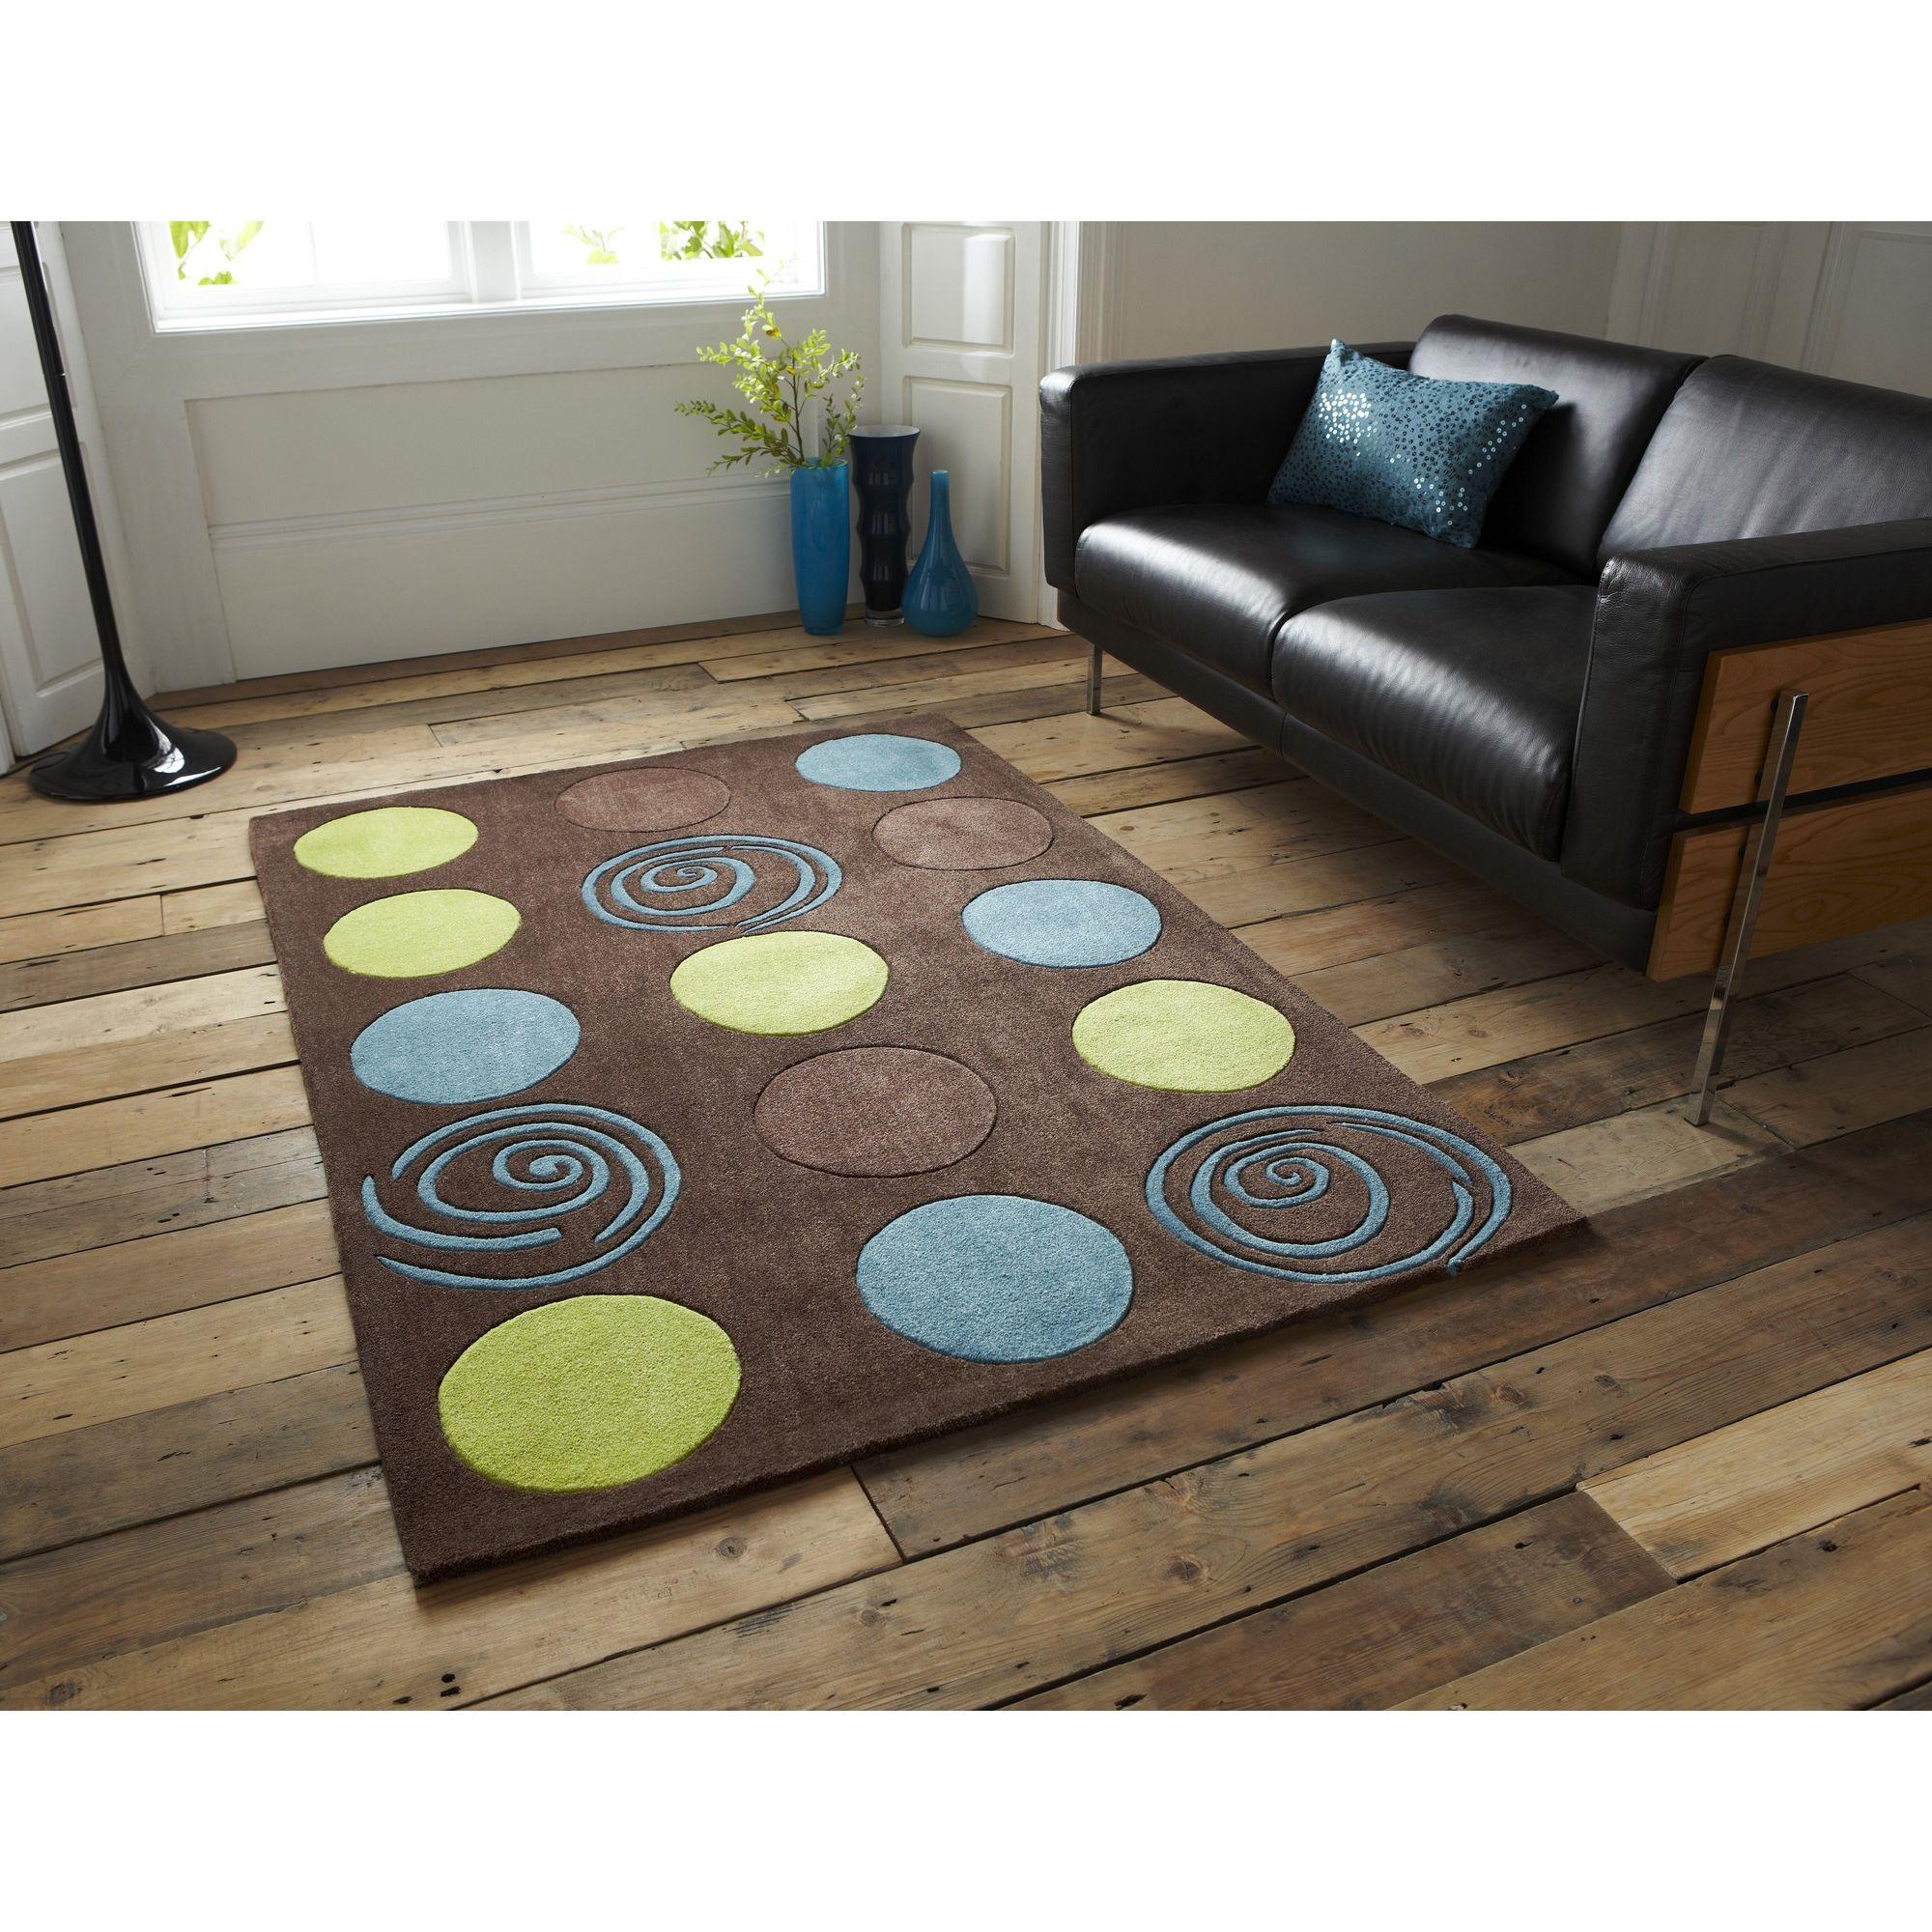 Oriental Carpets & Rugs Hong Kong Brown/Blue/Green Tufted Rug - 150cm L x 90cm W